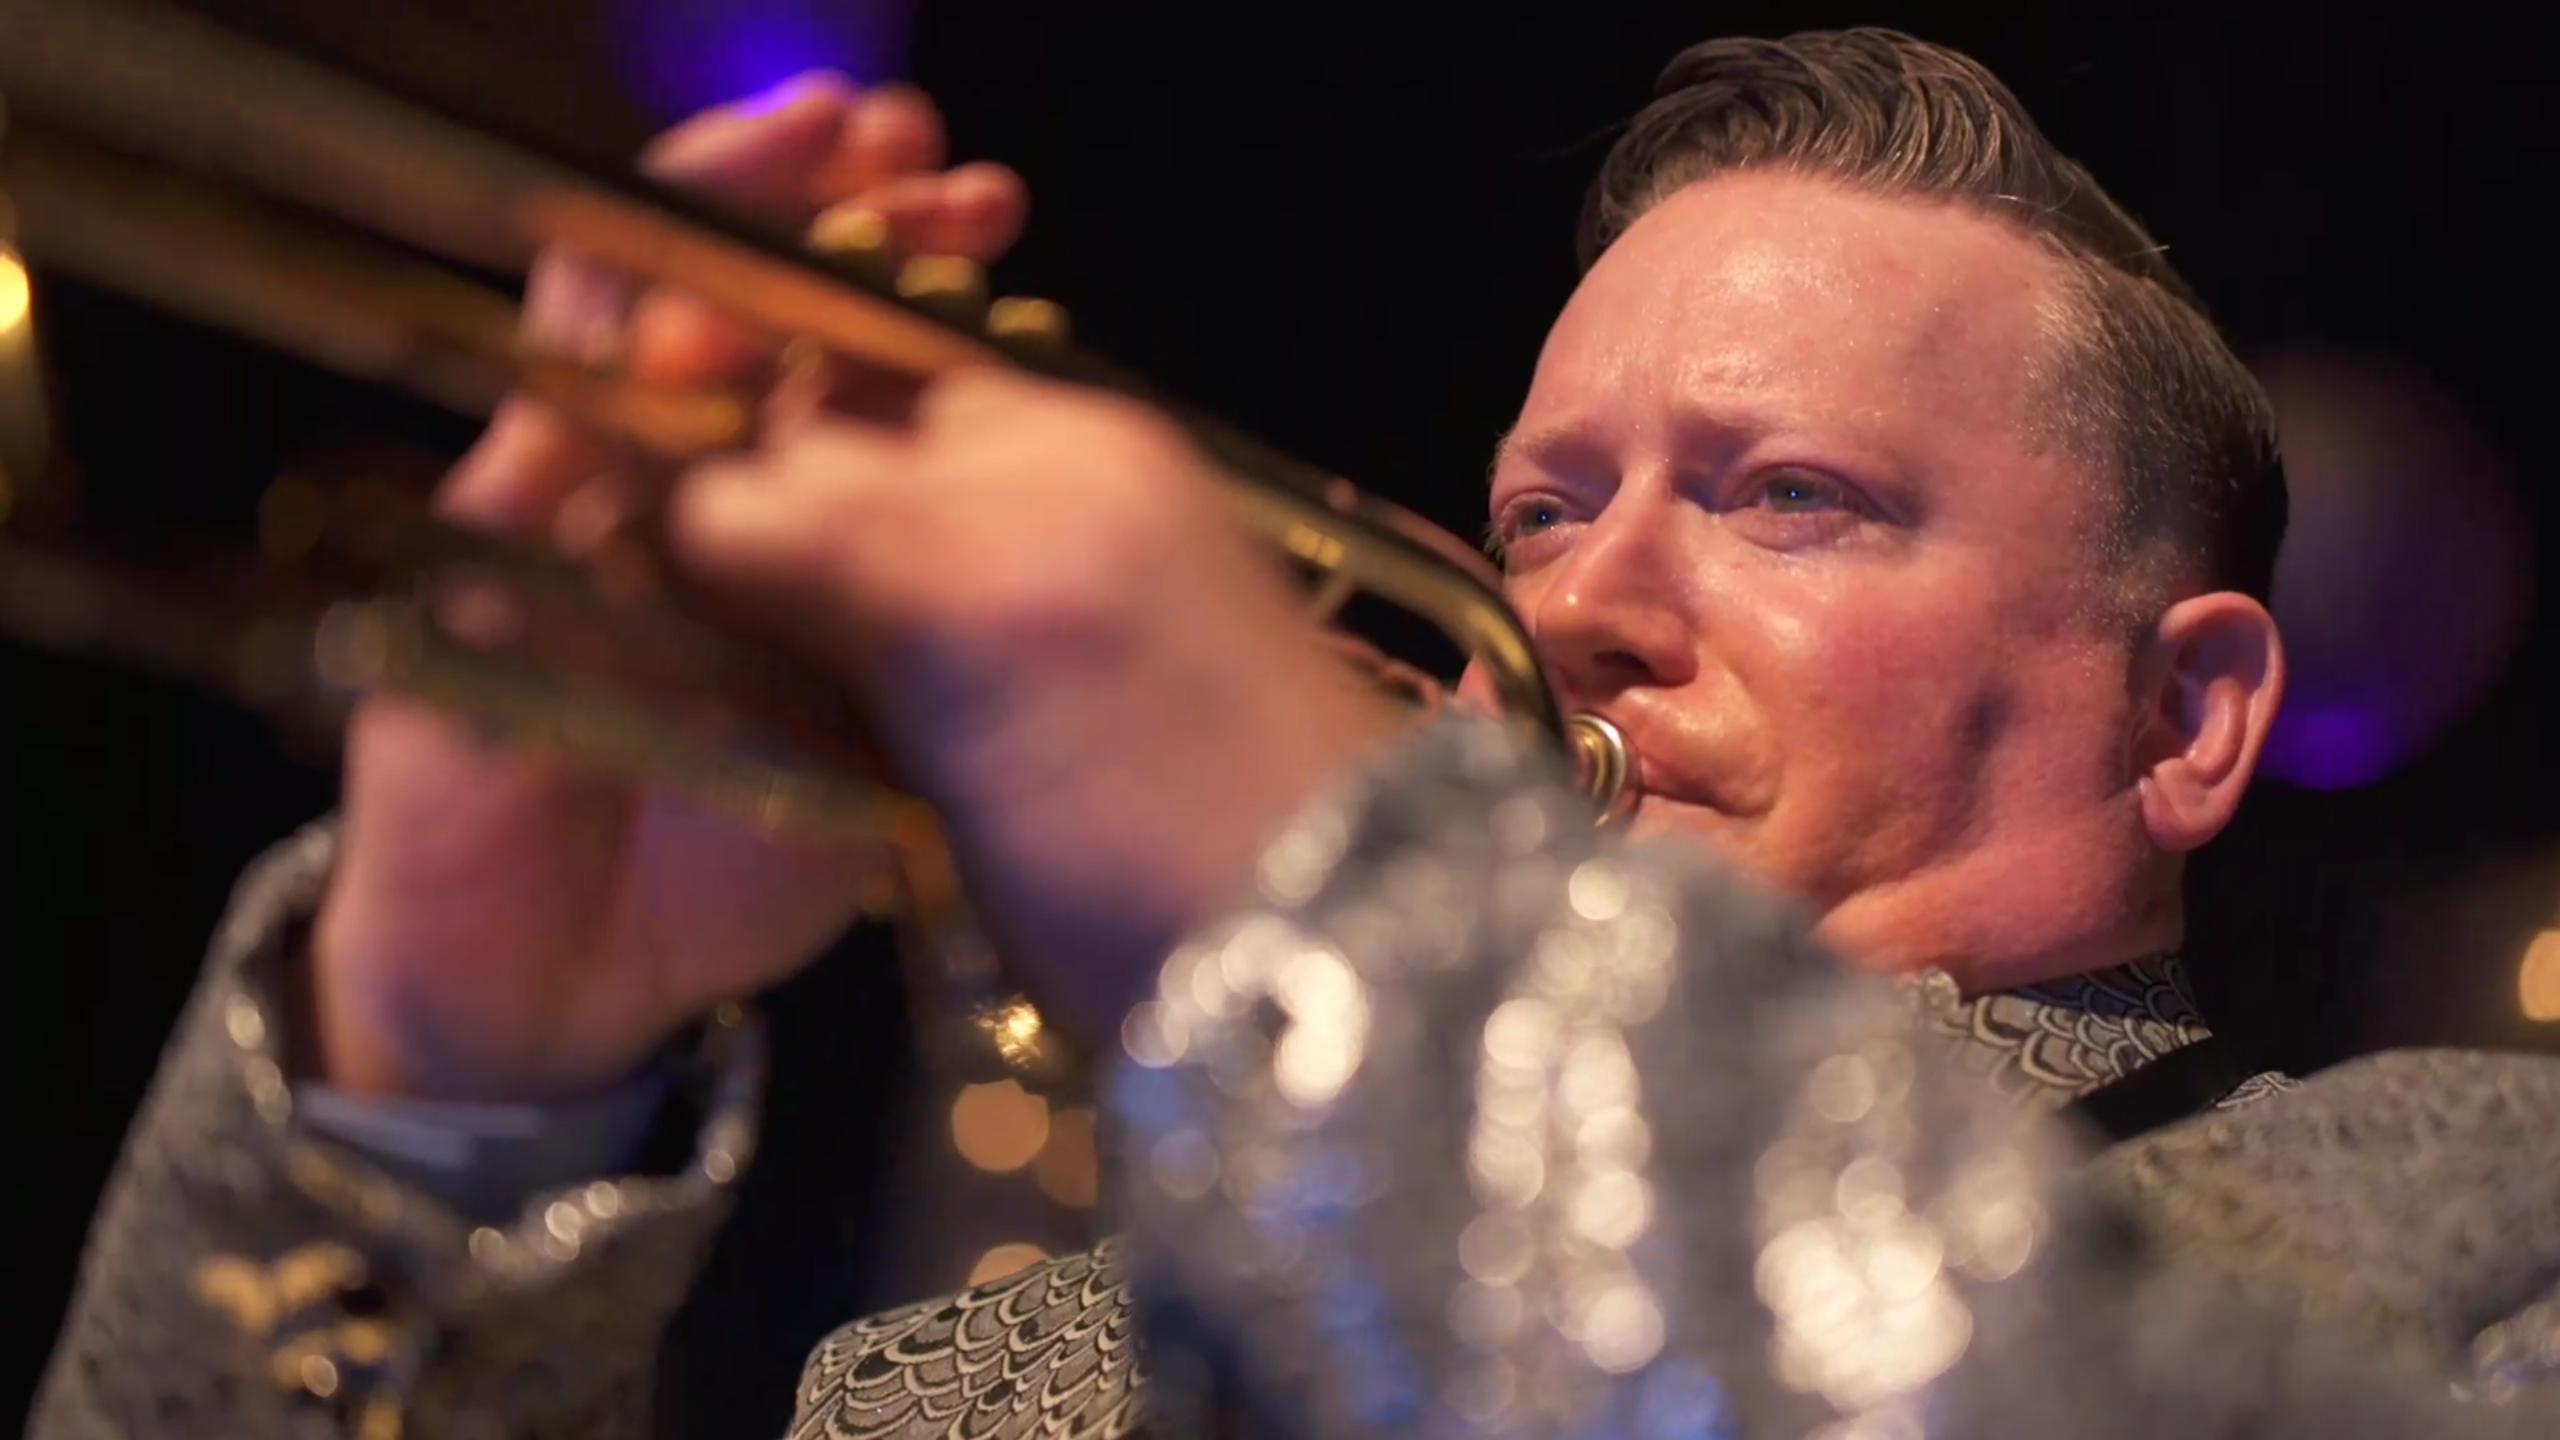 Kurt Thompson is creating Trumpet Lesson Tutorials and Performances